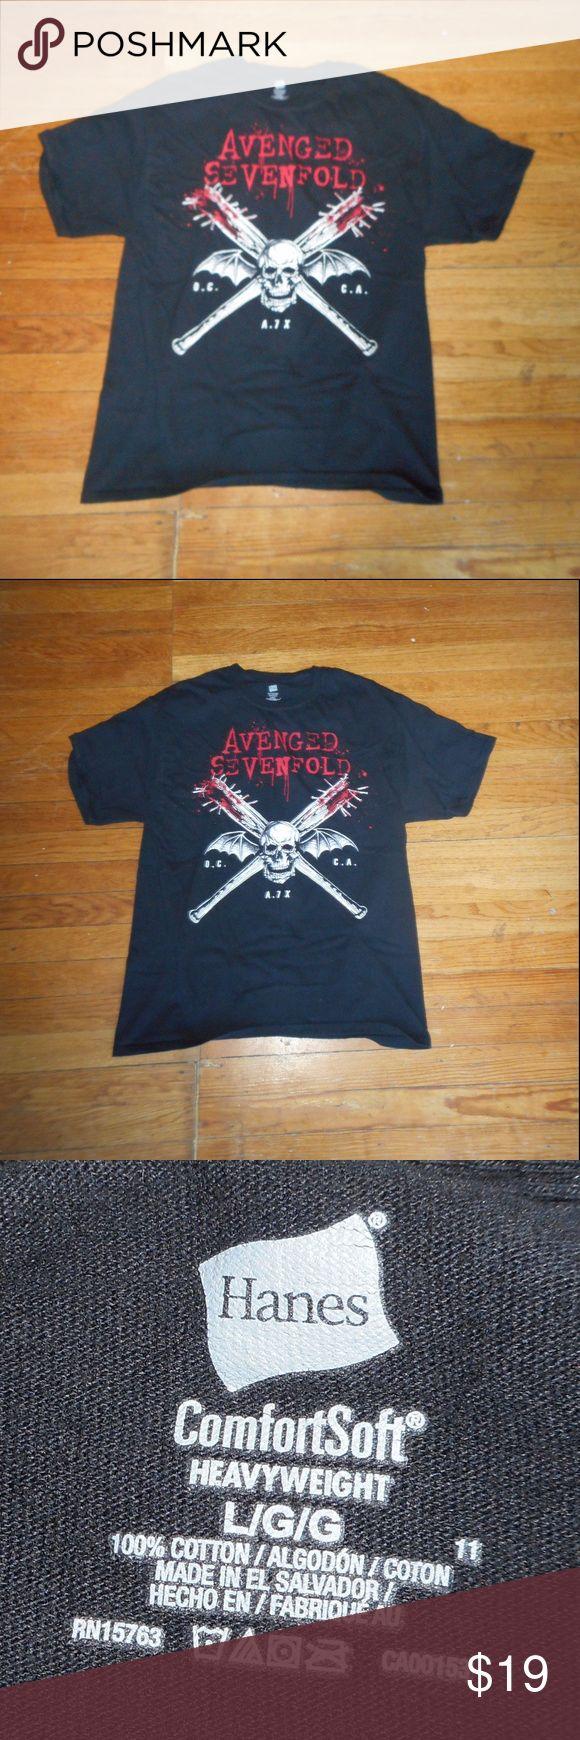 Avenged Sevenfold Crossbones band T shirt punk Avenged Sevenfold MENS Concert Tee Band T Shirt black L preowned great shape Hot Topic Shirts Tees - Short Sleeve